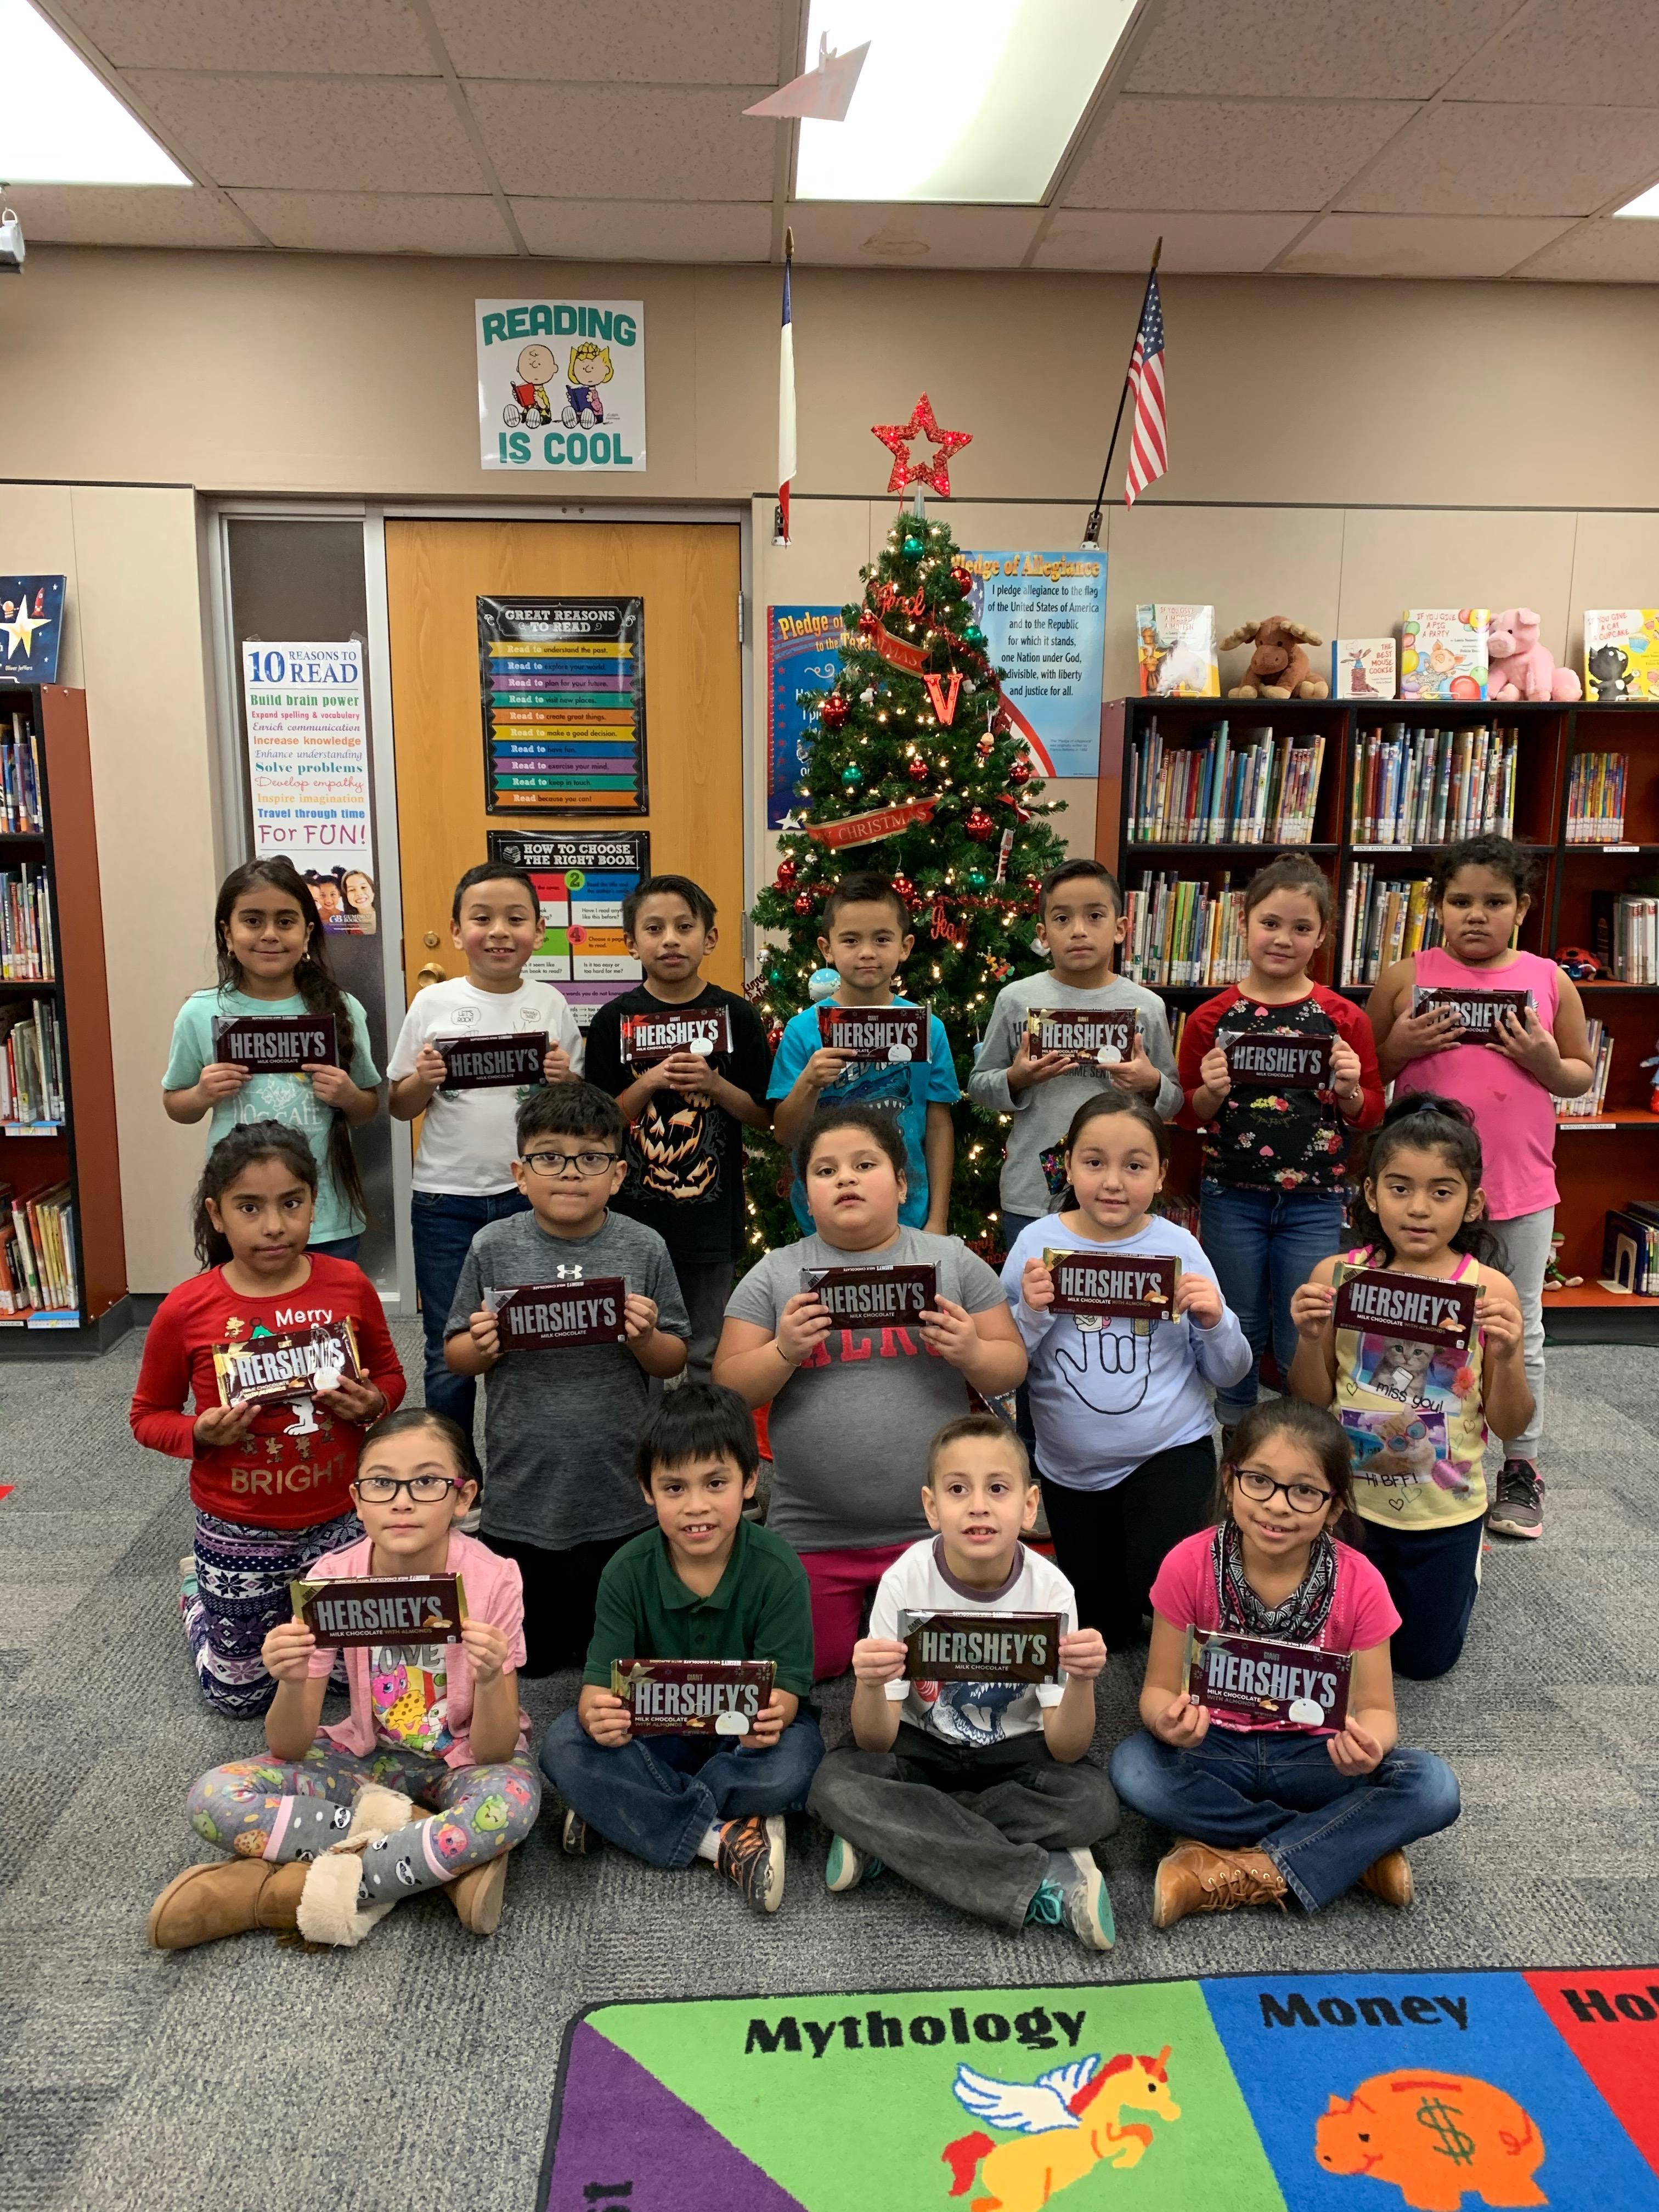 Mrs. Cardenas' Class. Most Words read Dec. 2 - 18, 2019.